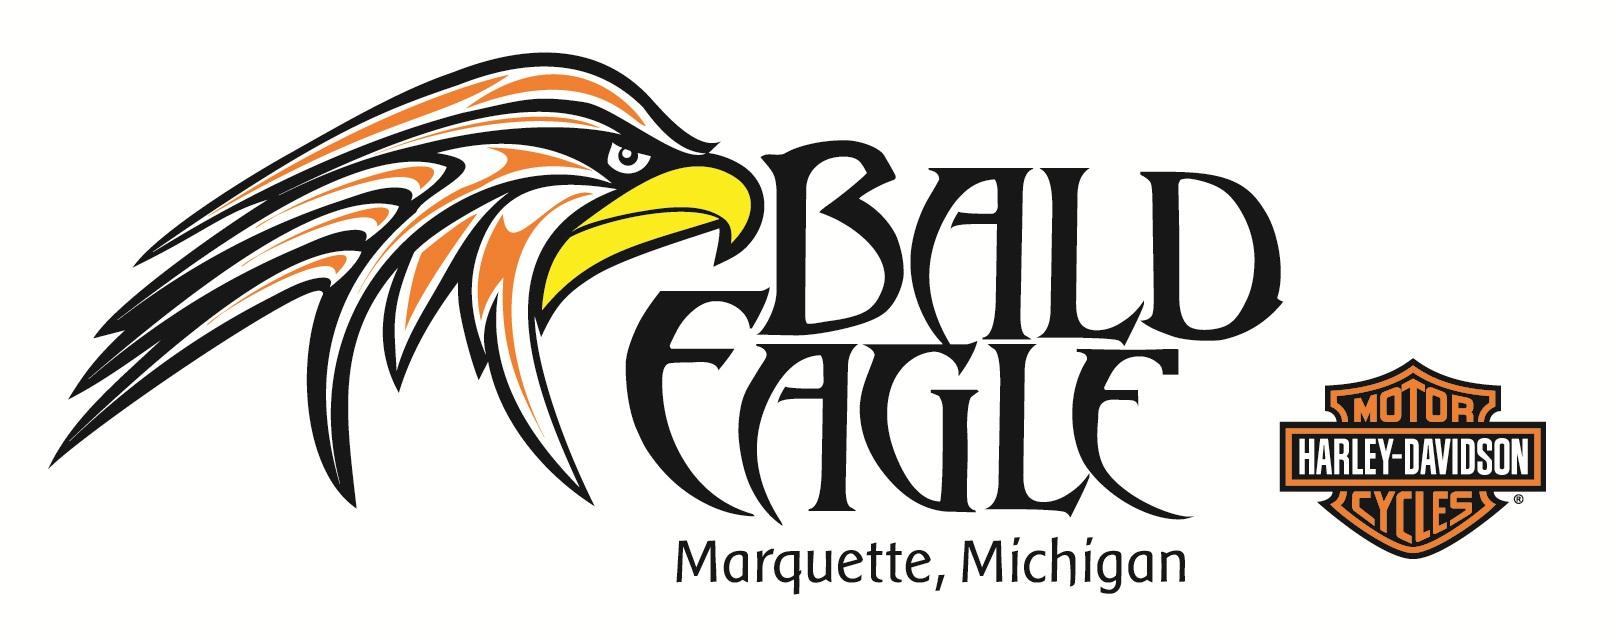 Bald Eagle Harley Davidson